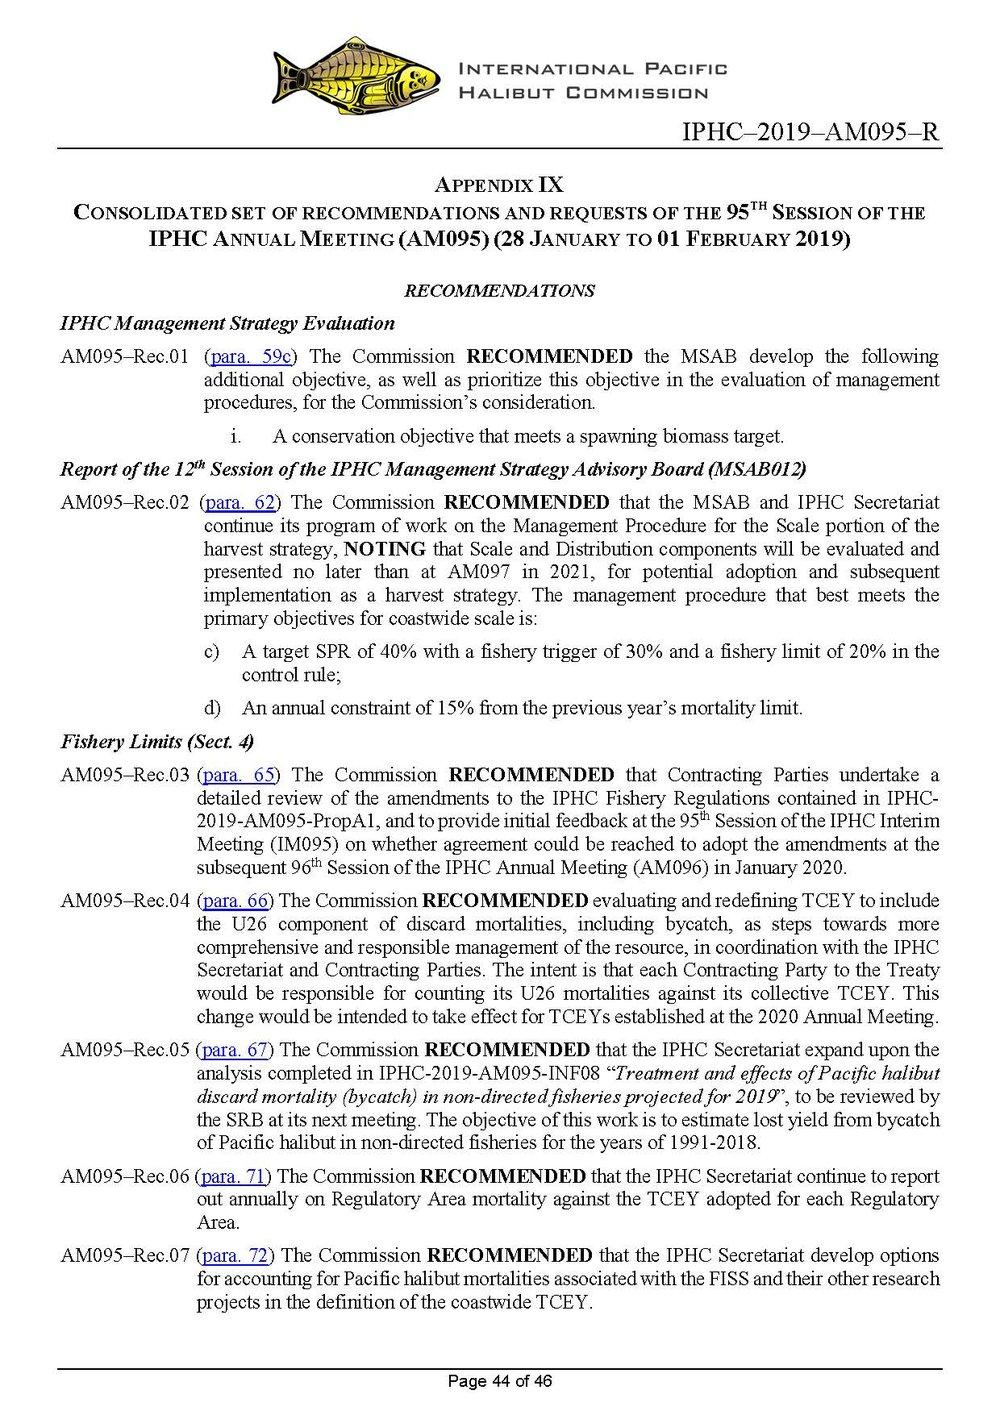 iphc-2019-am095-r_Page_44.jpg